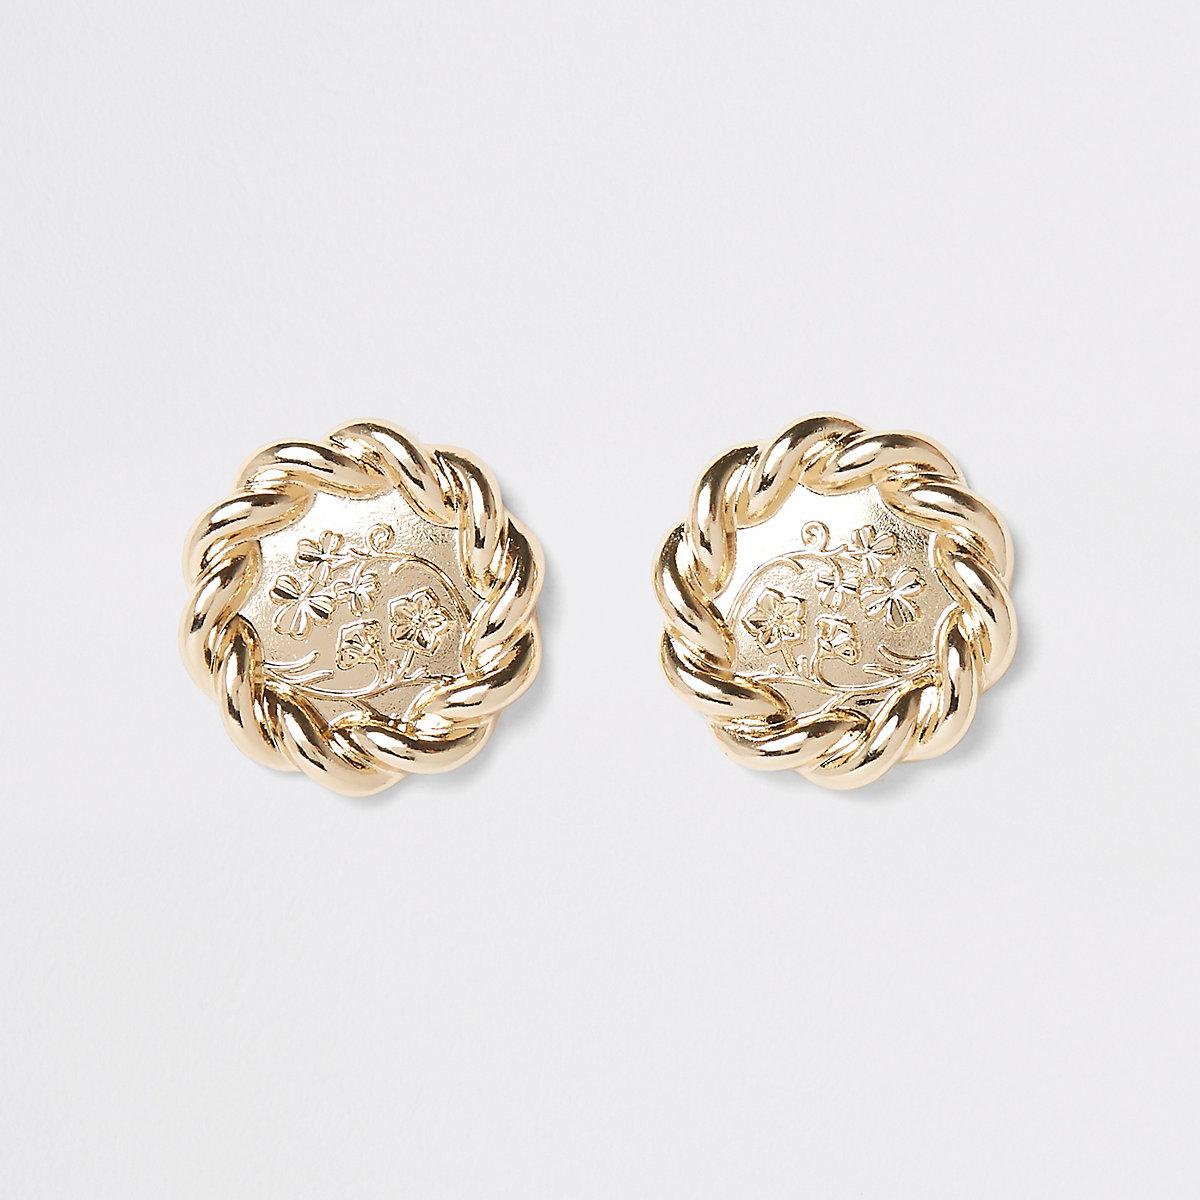 Gold color twist flower large stud earrings